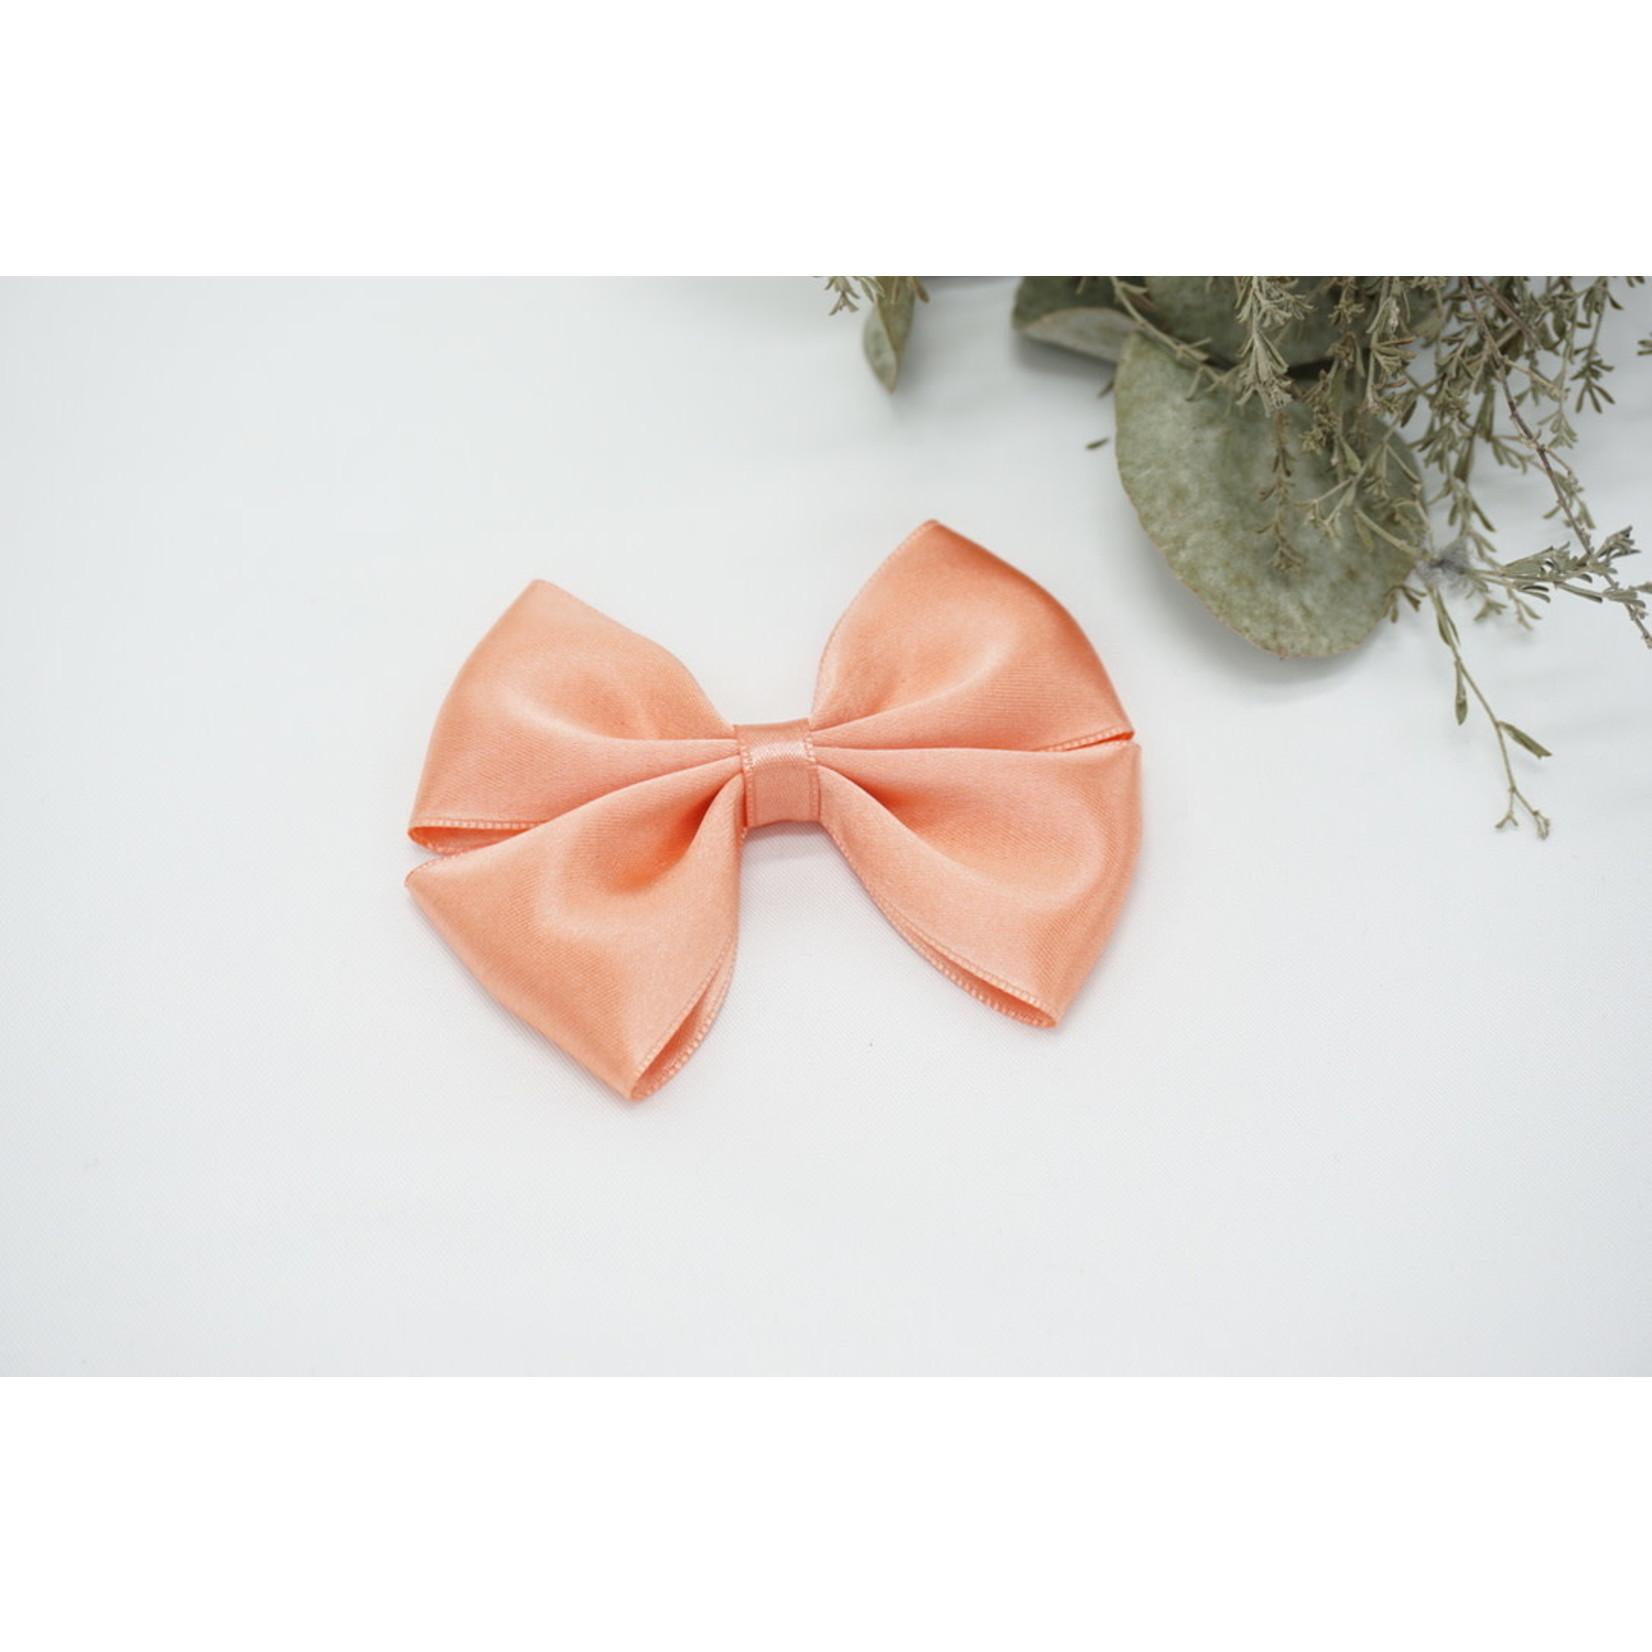 Petite Zara Satin Bow - Dark Salmon